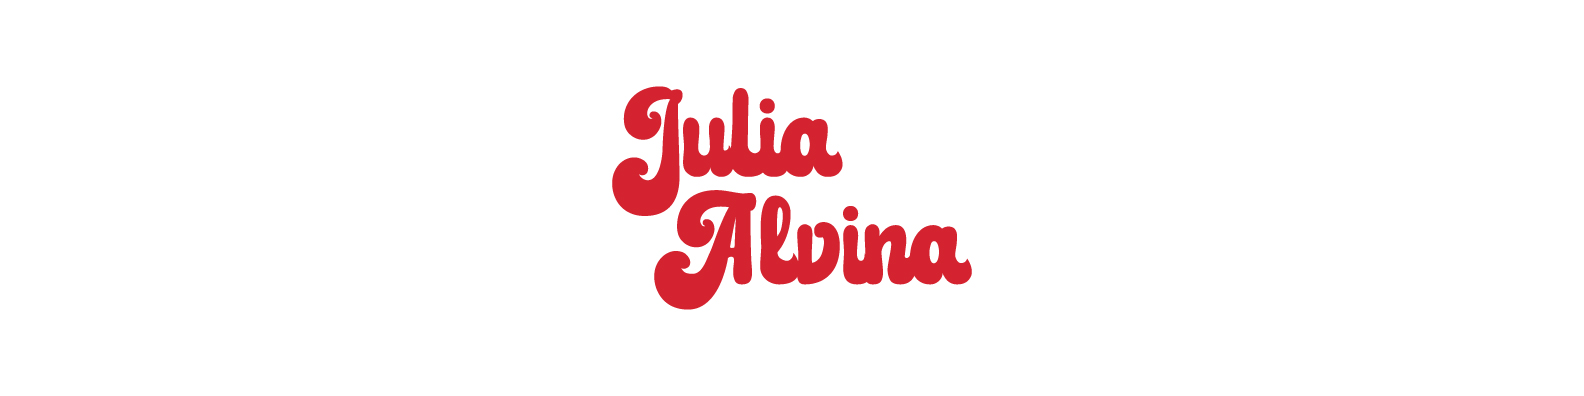 Julia Alvina